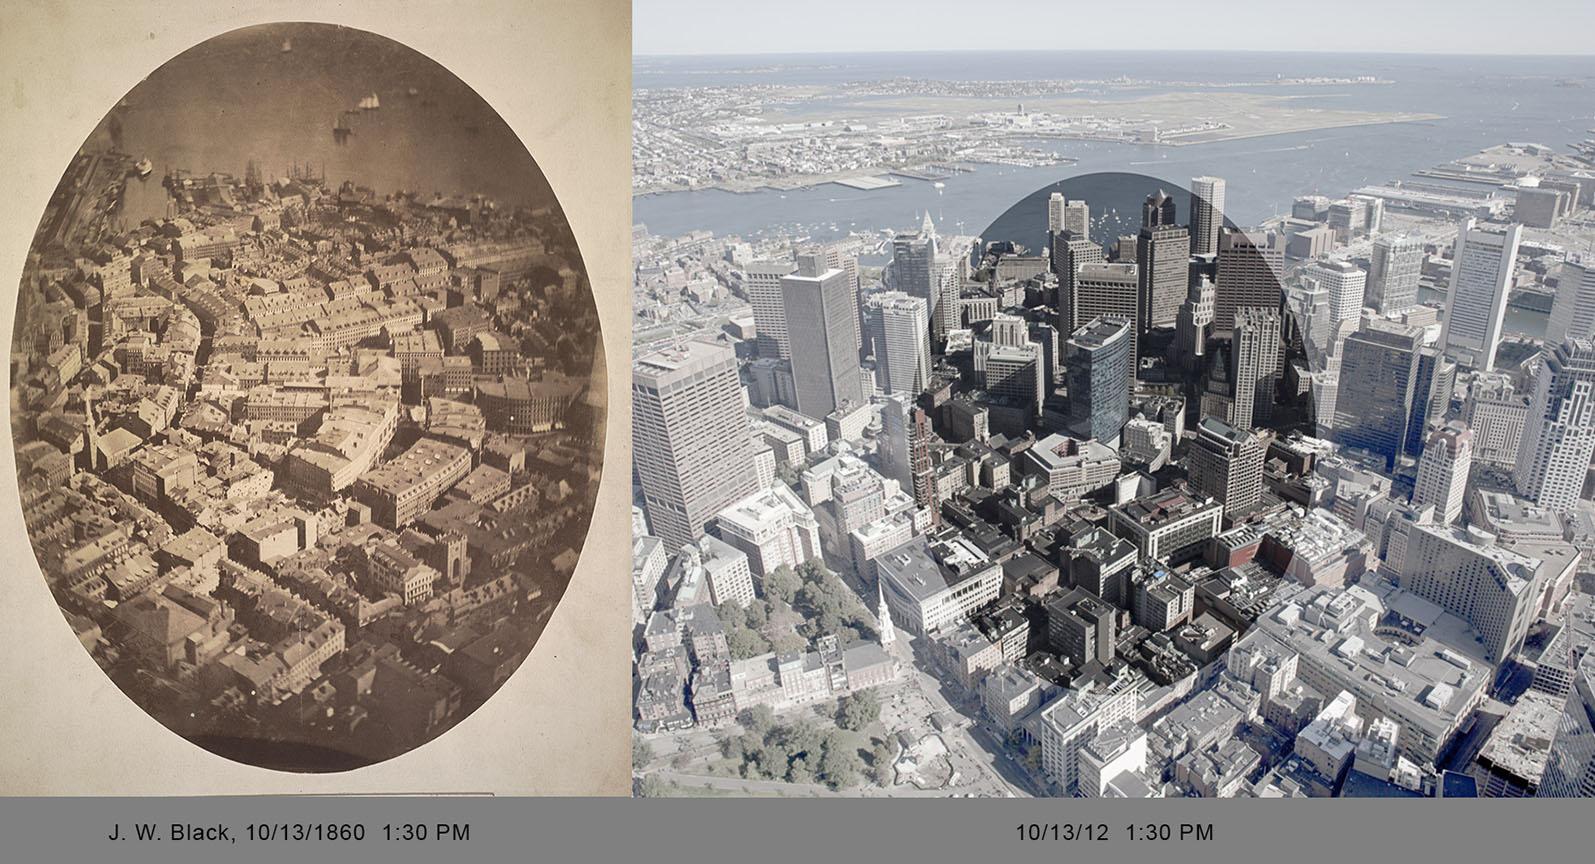 J. W. Black aerial photo